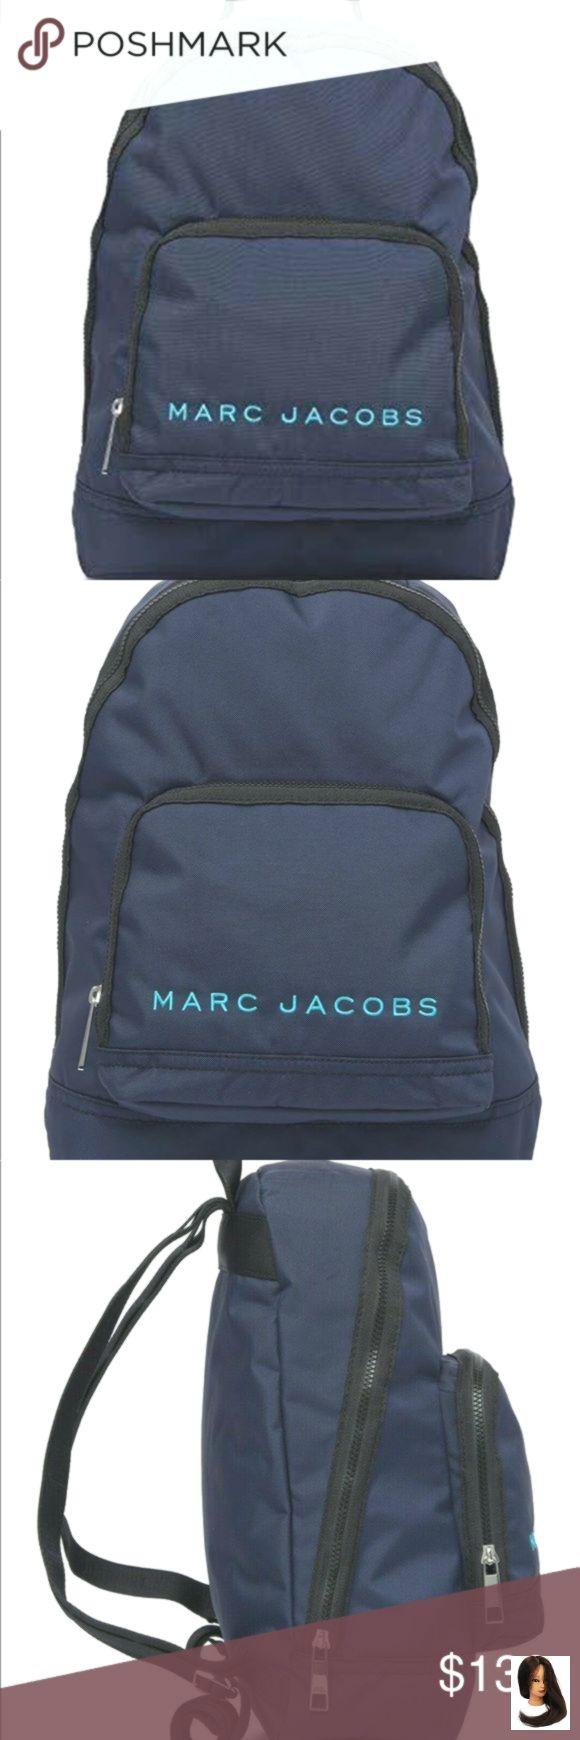 Nwt Marc Jacobs Backpack Indigo Nwt Marc Jacoobs Backpack Indigo Brand Marc